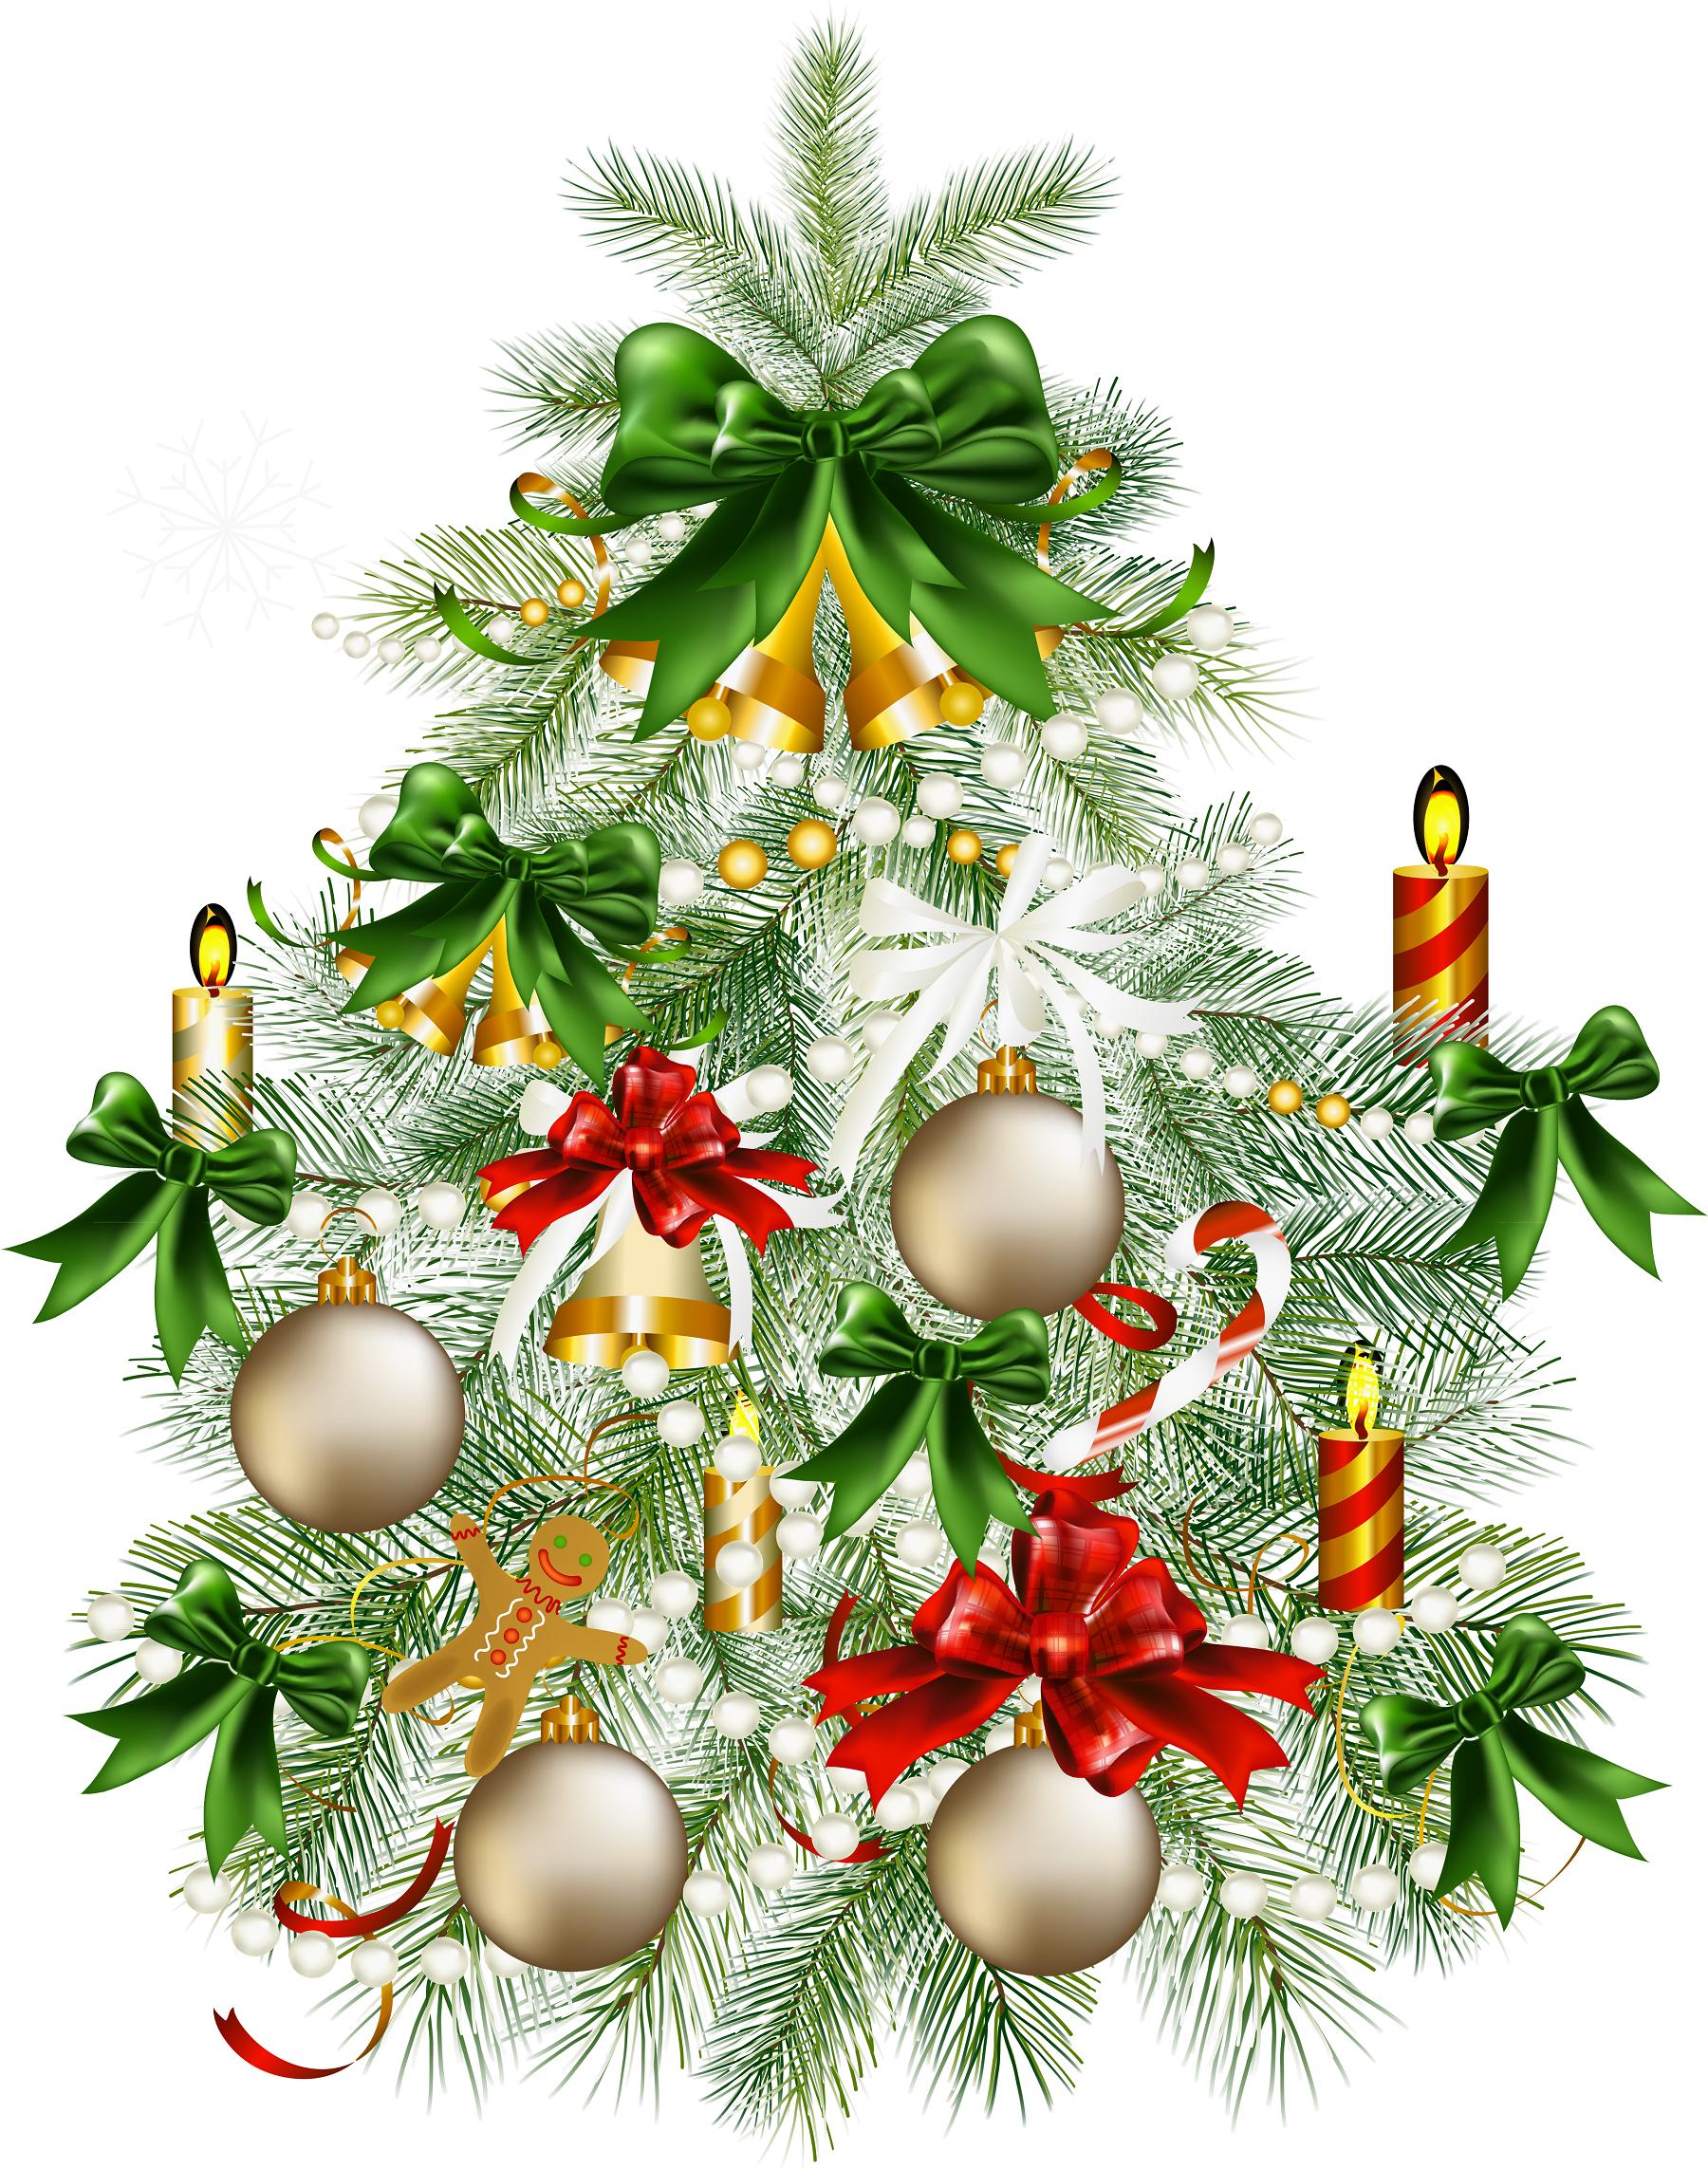 Poinsettia clipart christmas tree branches ART Christmas Pinterest tree tree